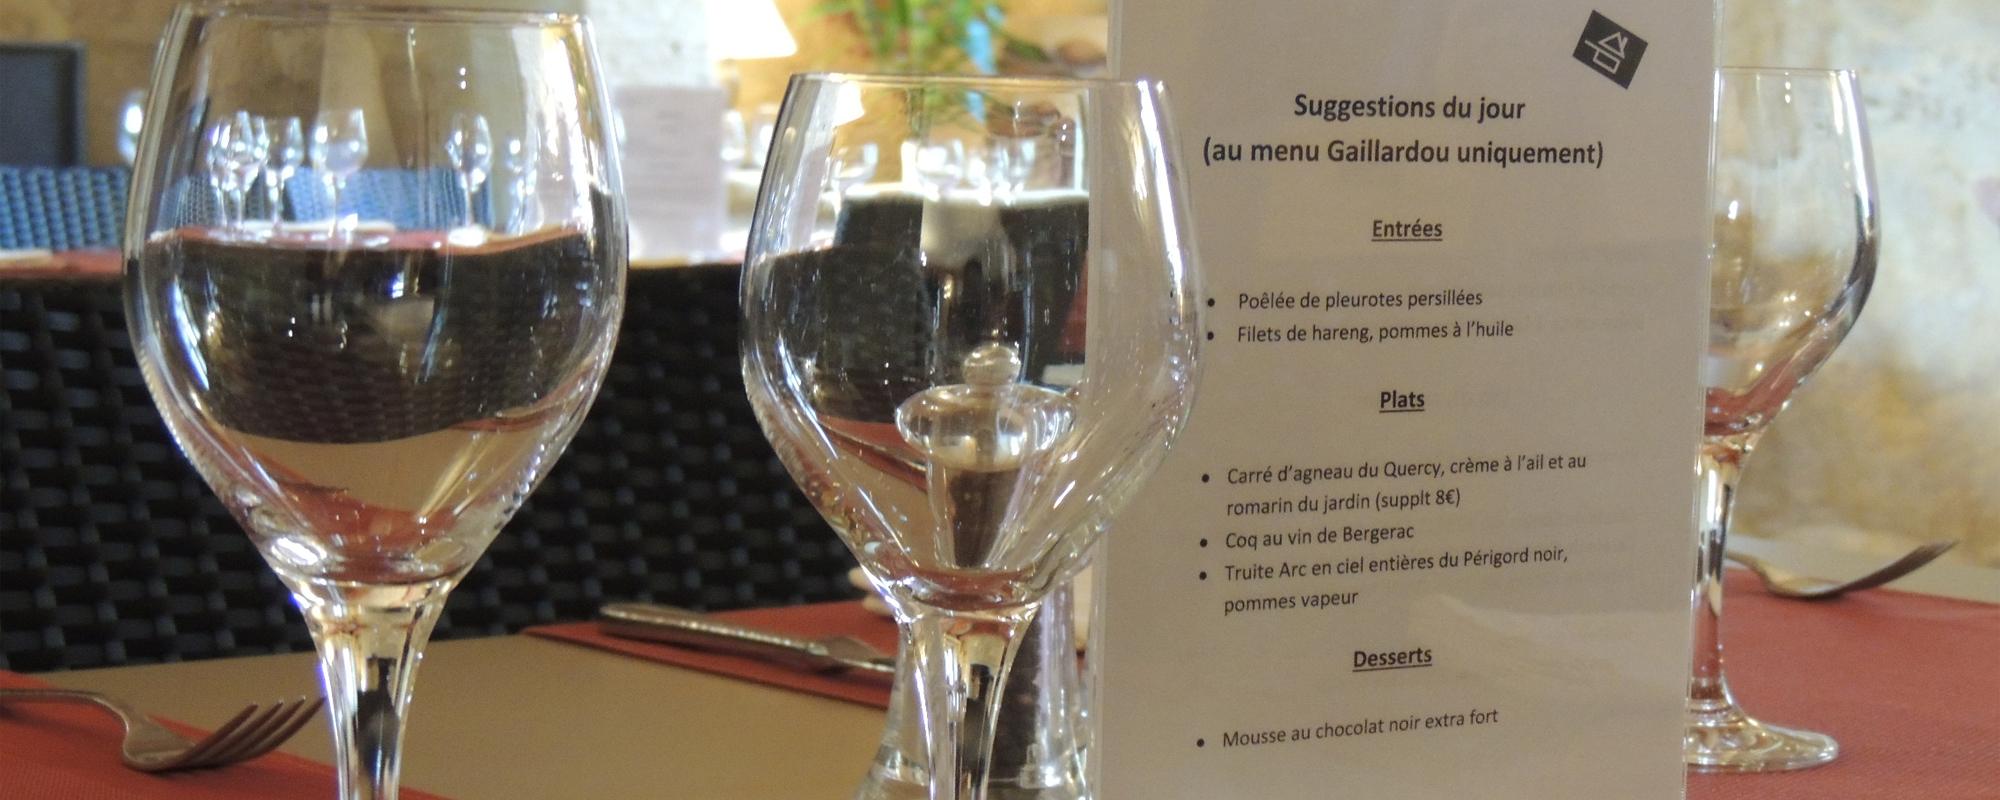 restaurant-les-pres-gaillardou-la-roque-gageac